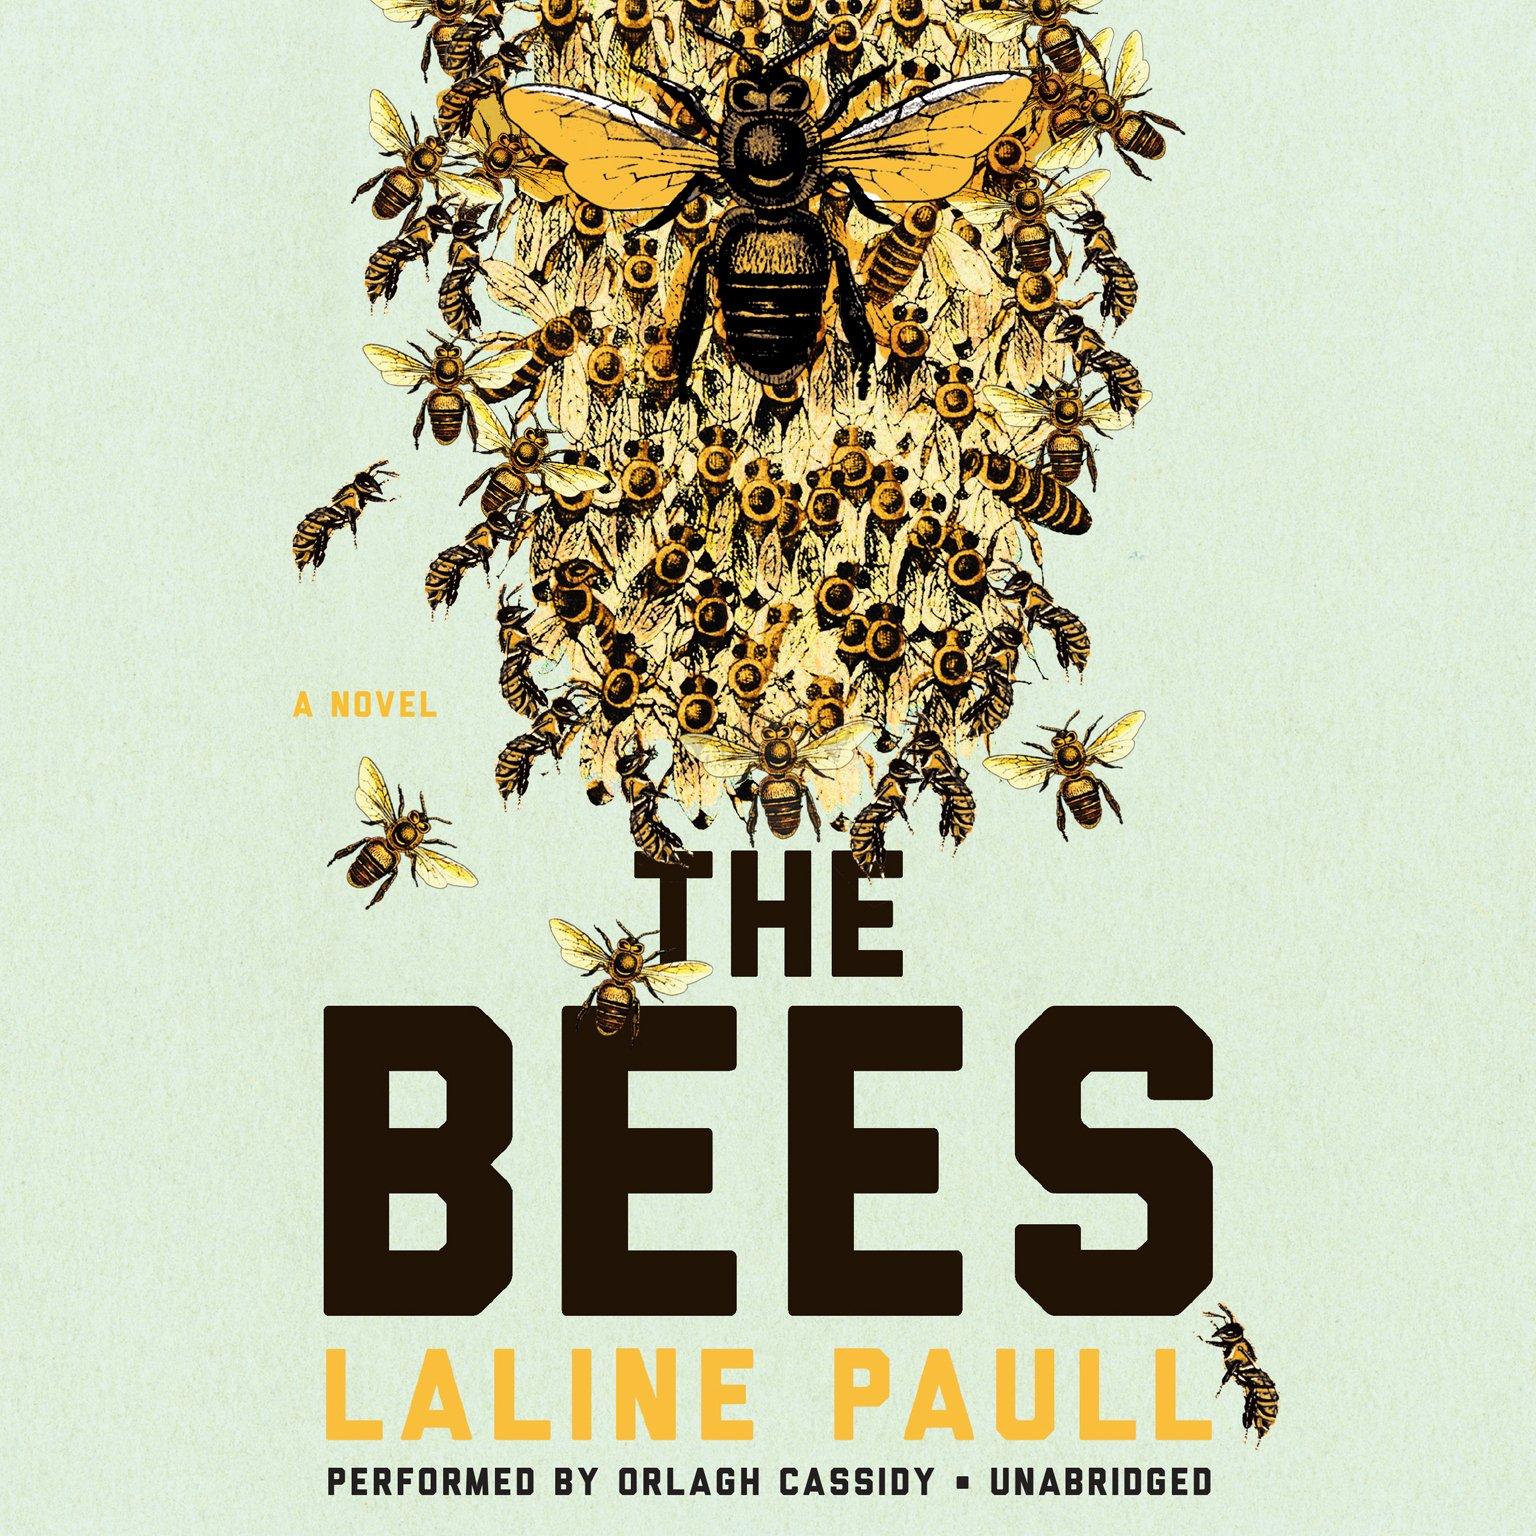 The Bees A Novel Laline Paull 9781483004082 Amazon Com Books